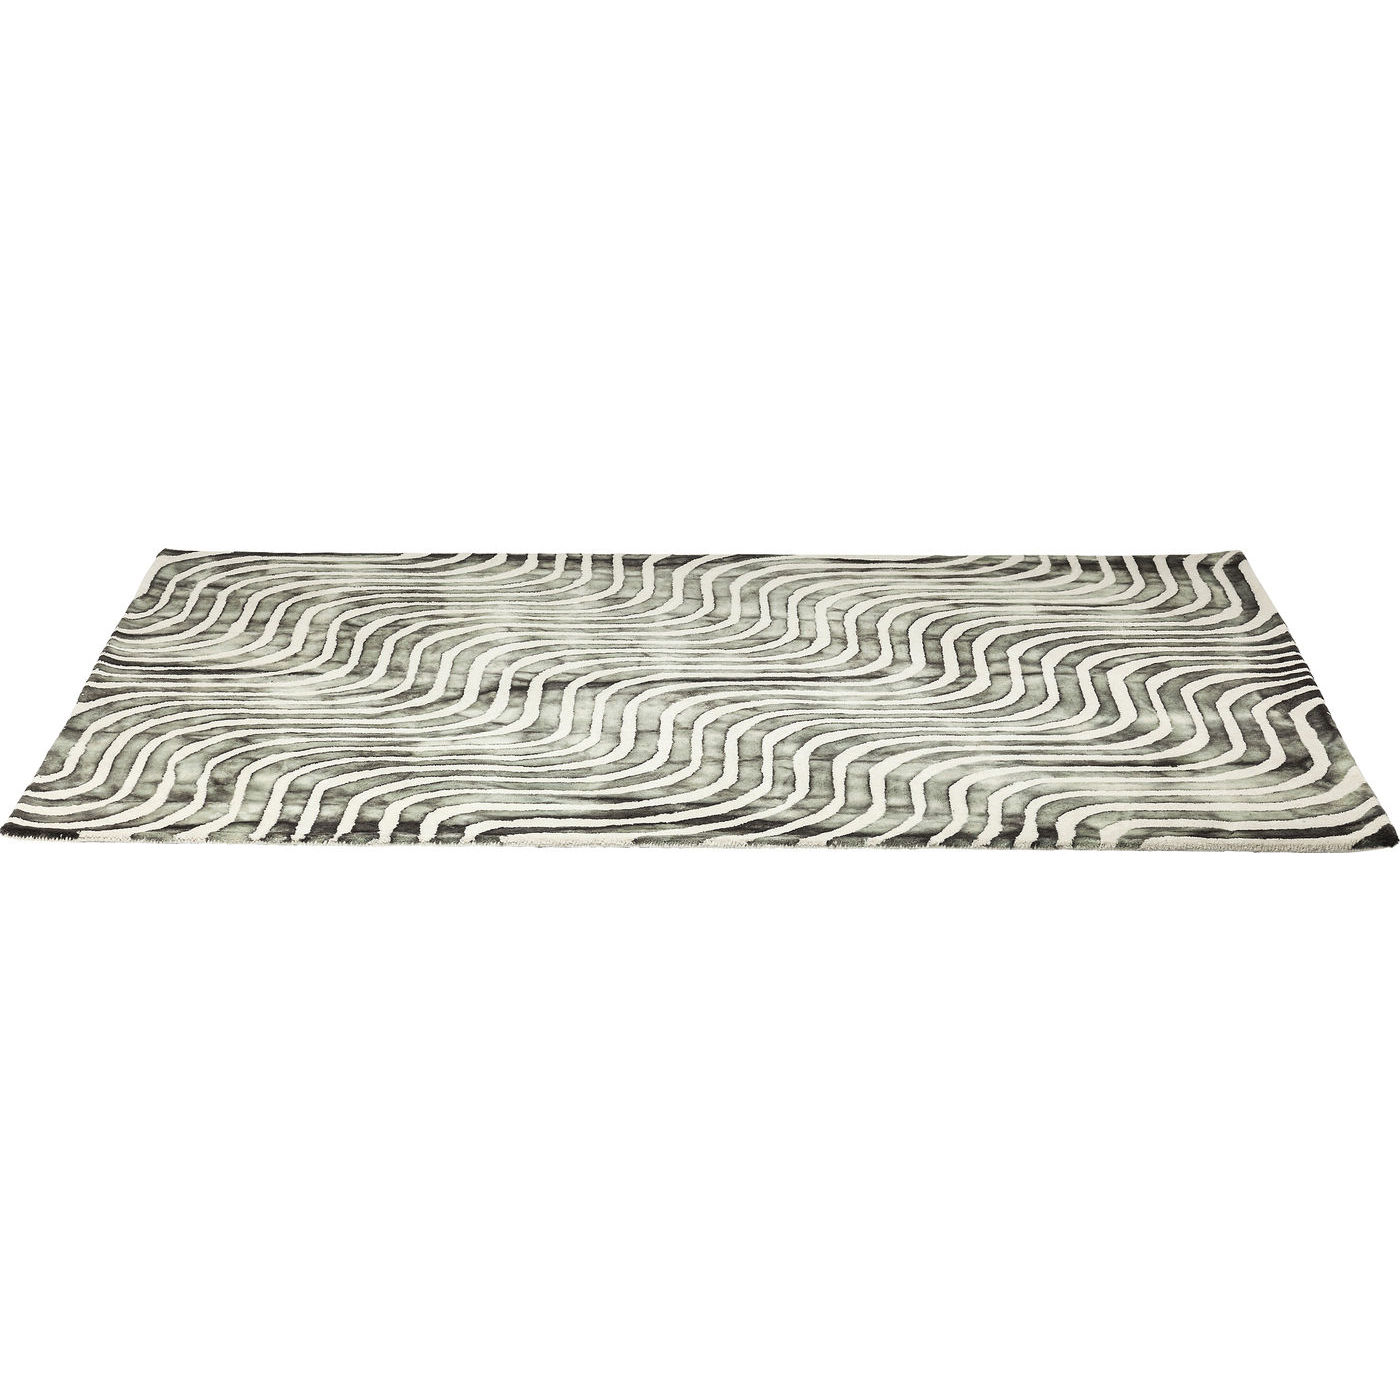 Image of   Kare Design Tæppe, La Ola Gray 170x240cm